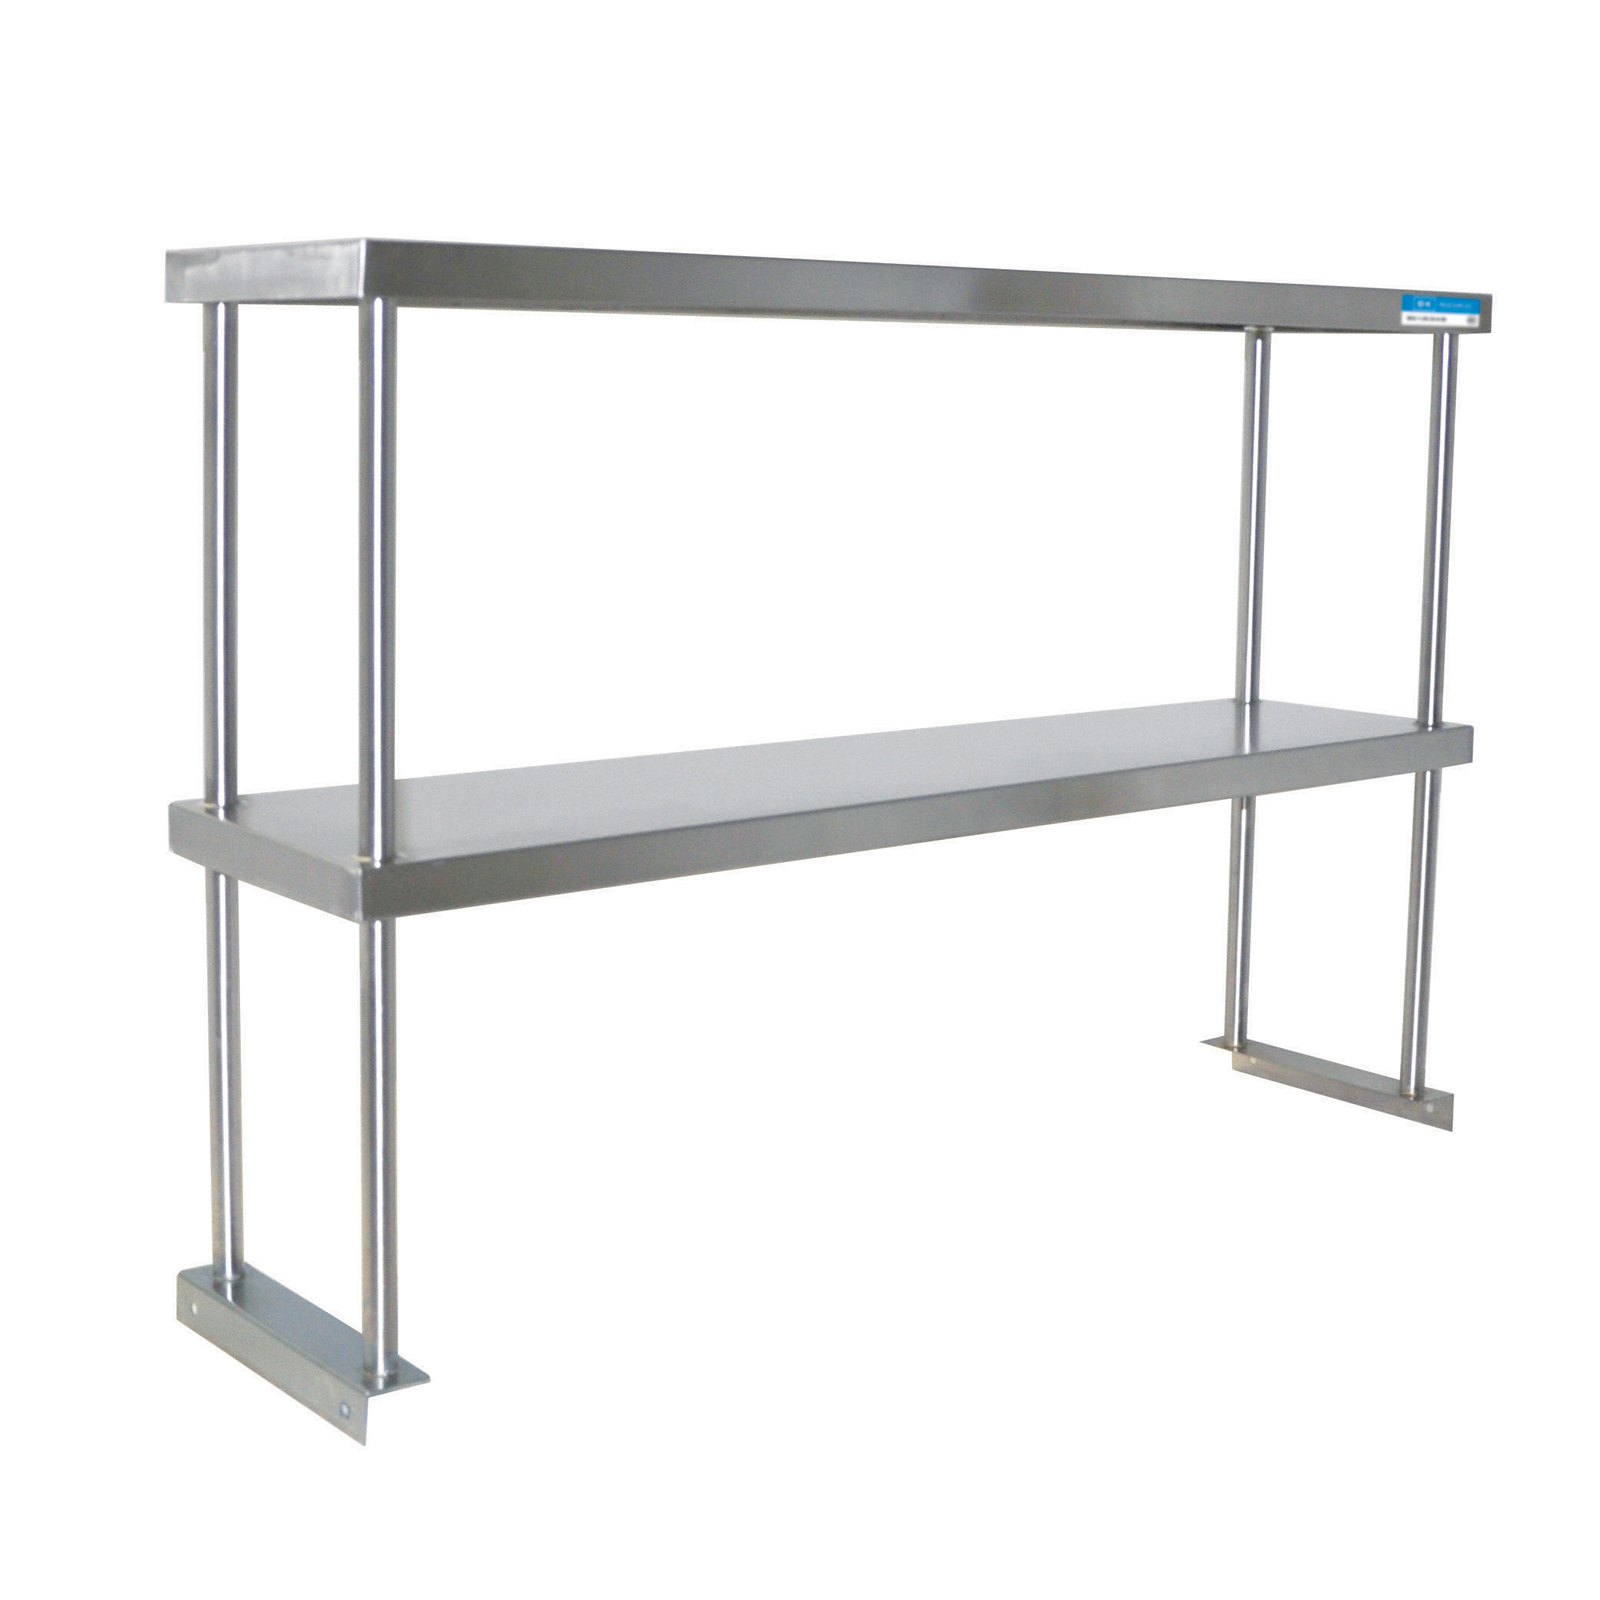 BK Resources BK-OSD-1836 overshelf, table-mounted